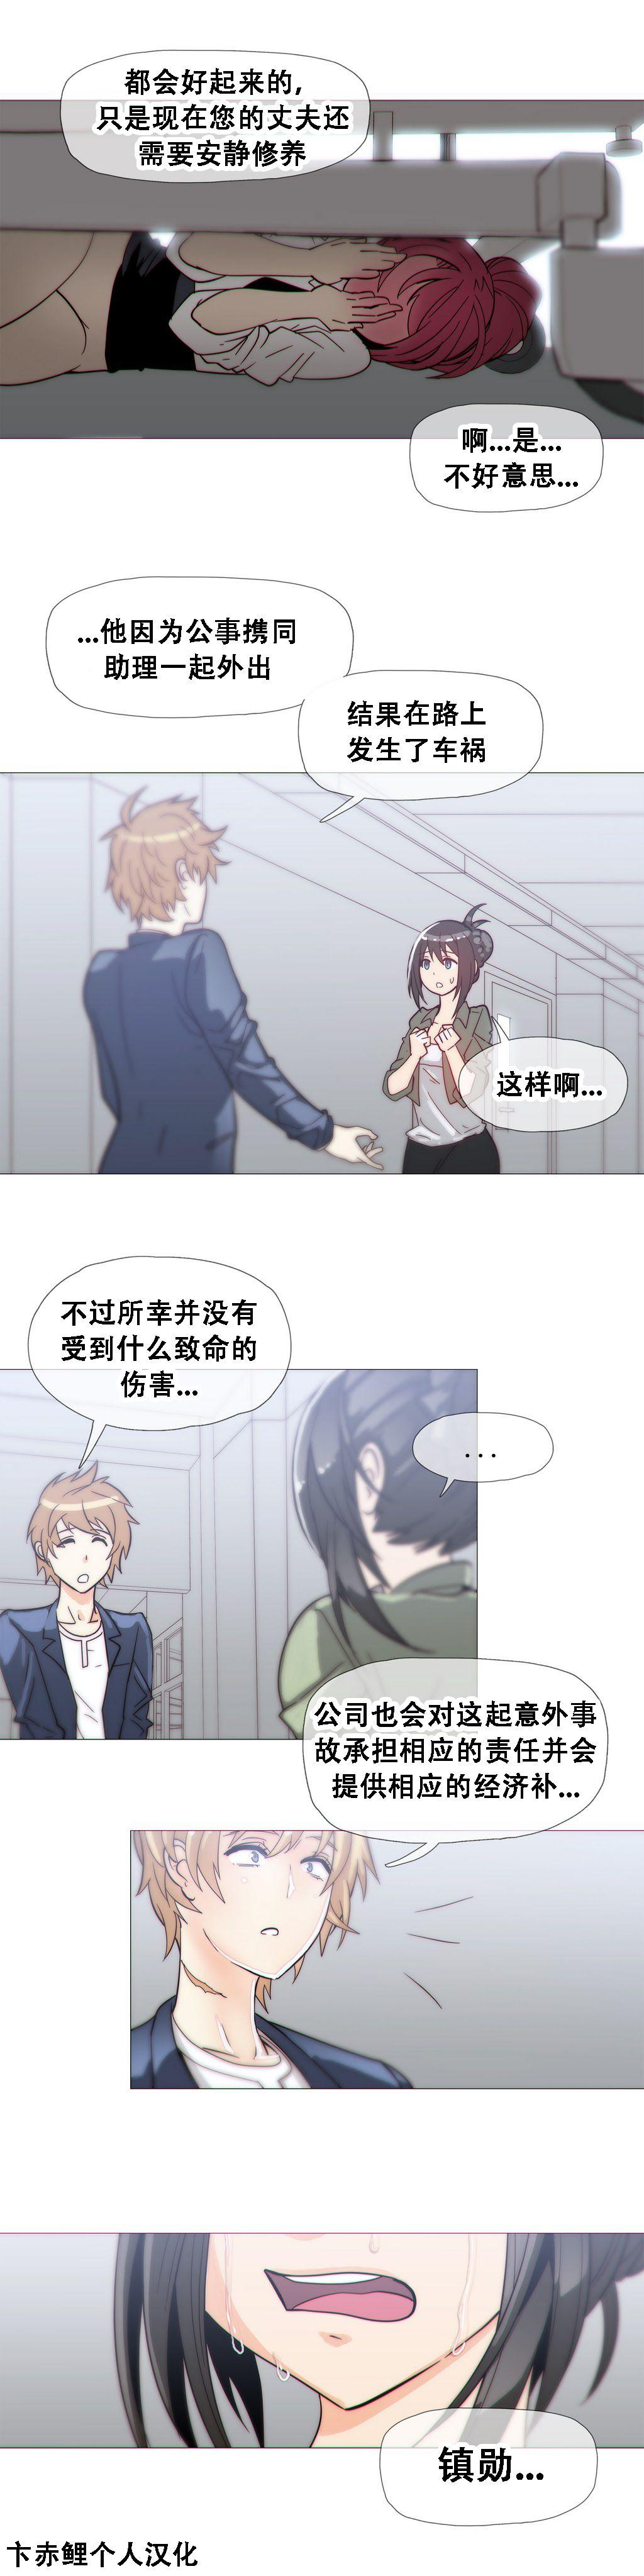 HouseHold Affairs 【卞赤鲤个人汉化】1~33话(持续更新中) 443